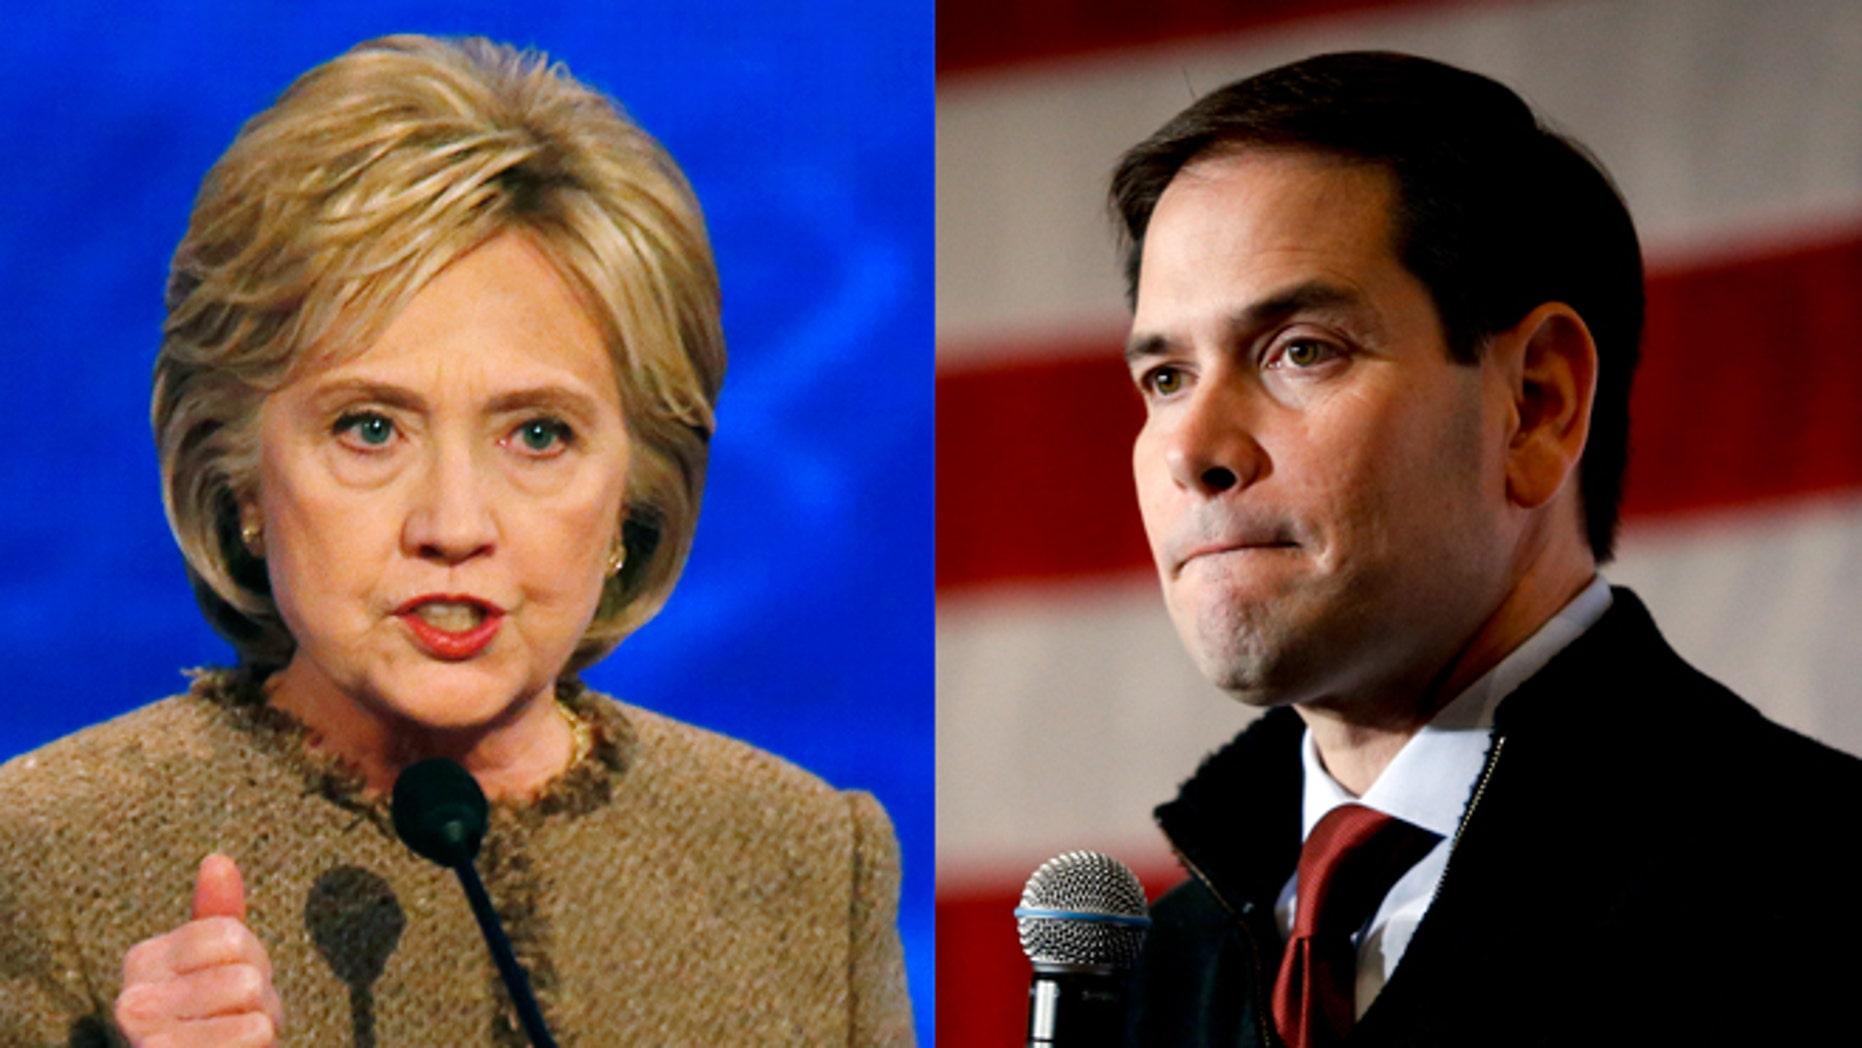 Hillary Clinton (left) and Marco Rubio. (Photos: Associated Press)